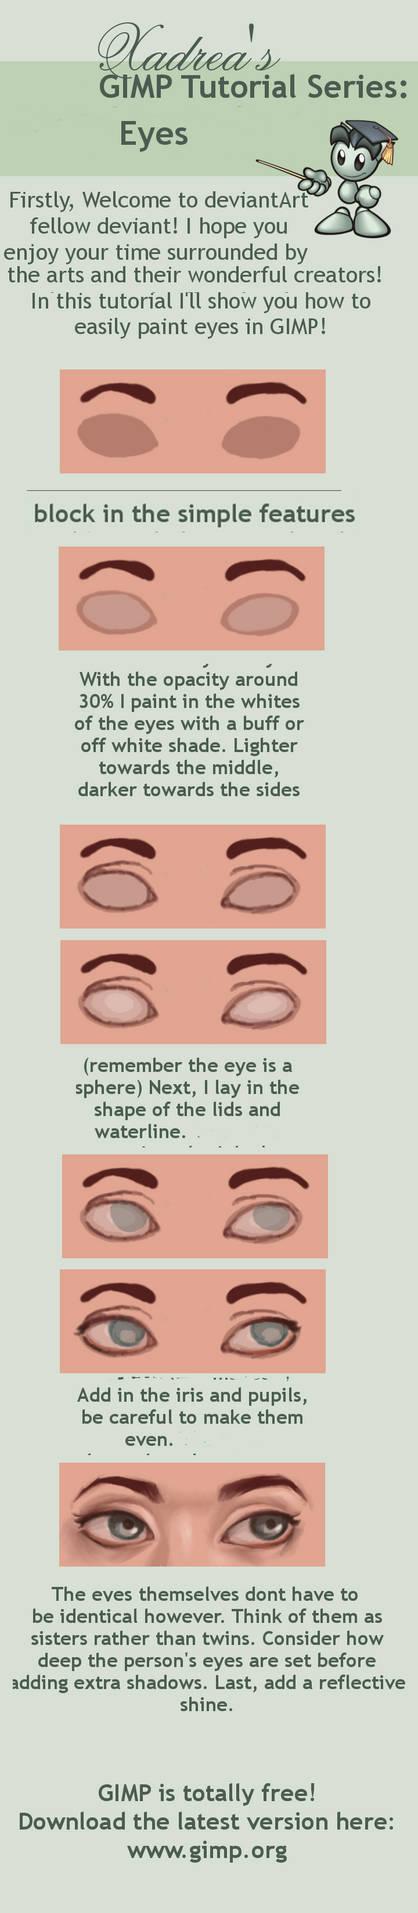 GIMP Tutorial: Eyes